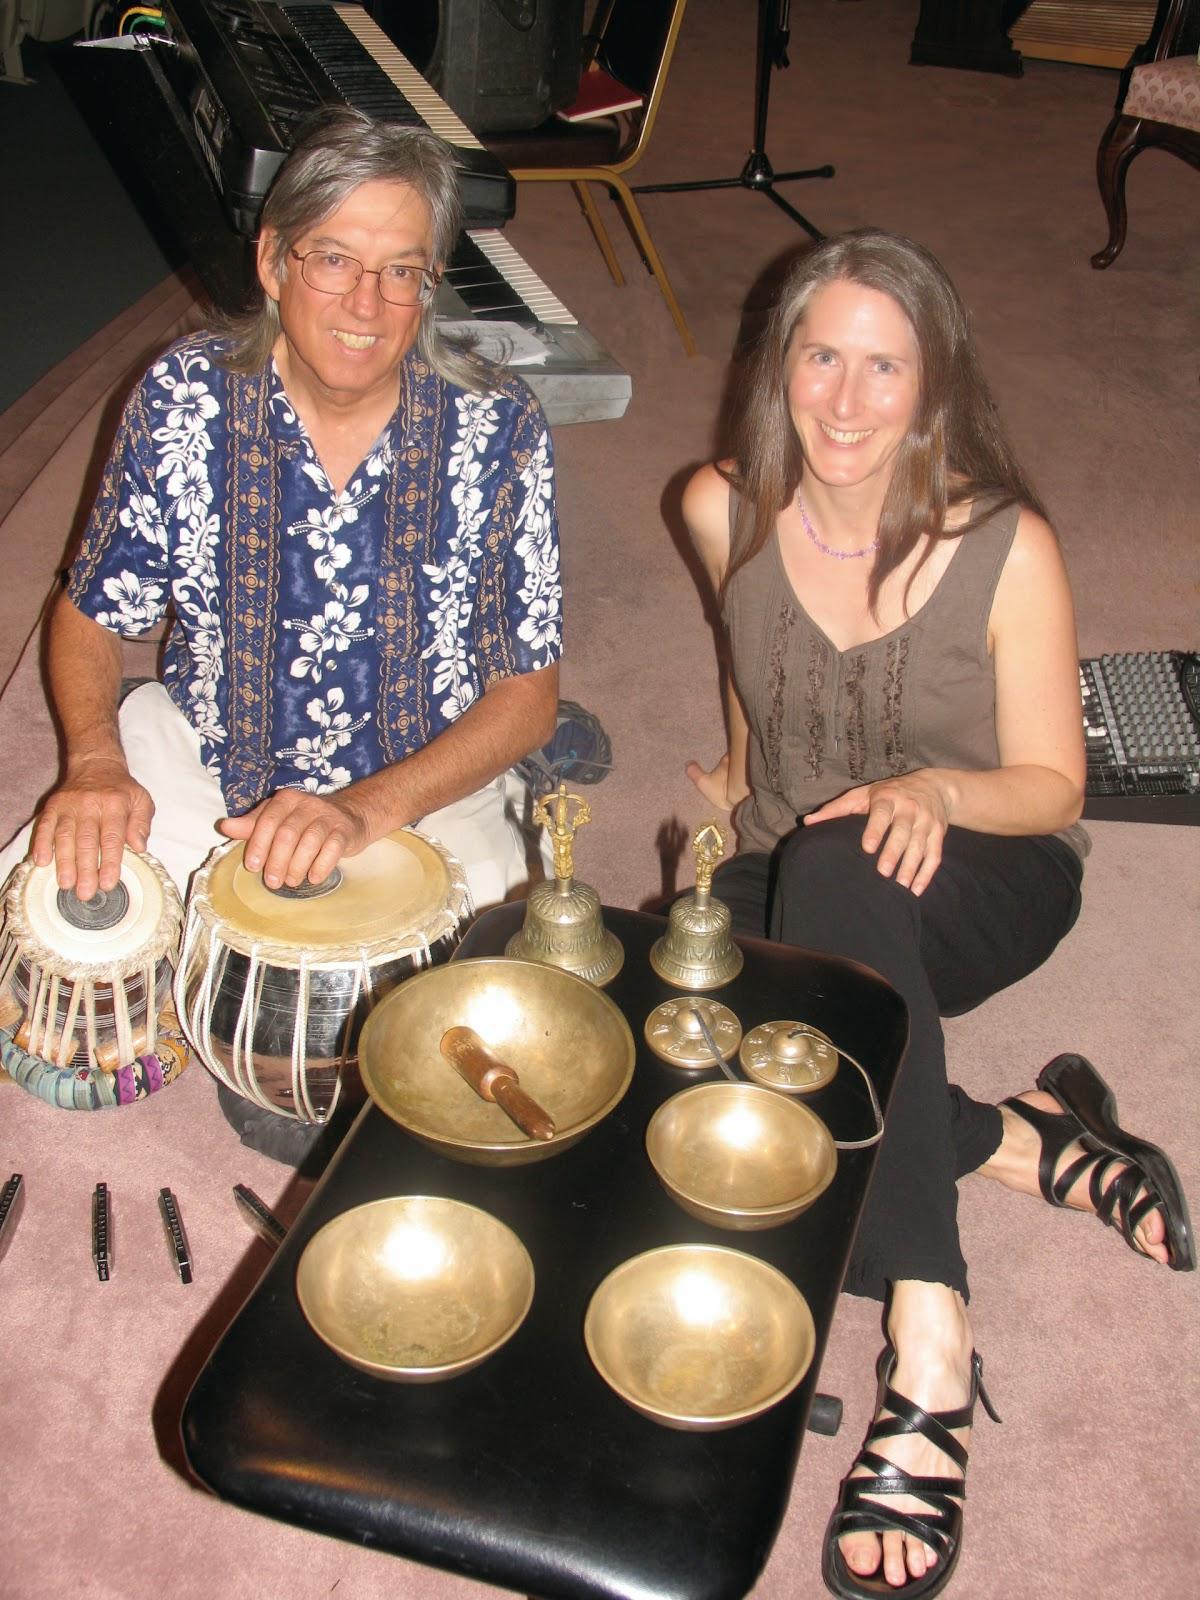 Anton Mizerak and Laura Berryhill Perform in San Clemente